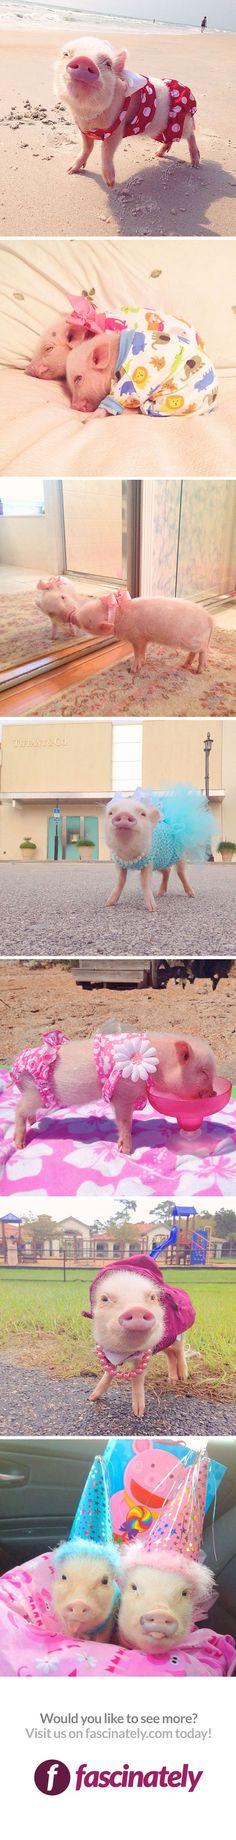 The Cutest Pig at the Beach